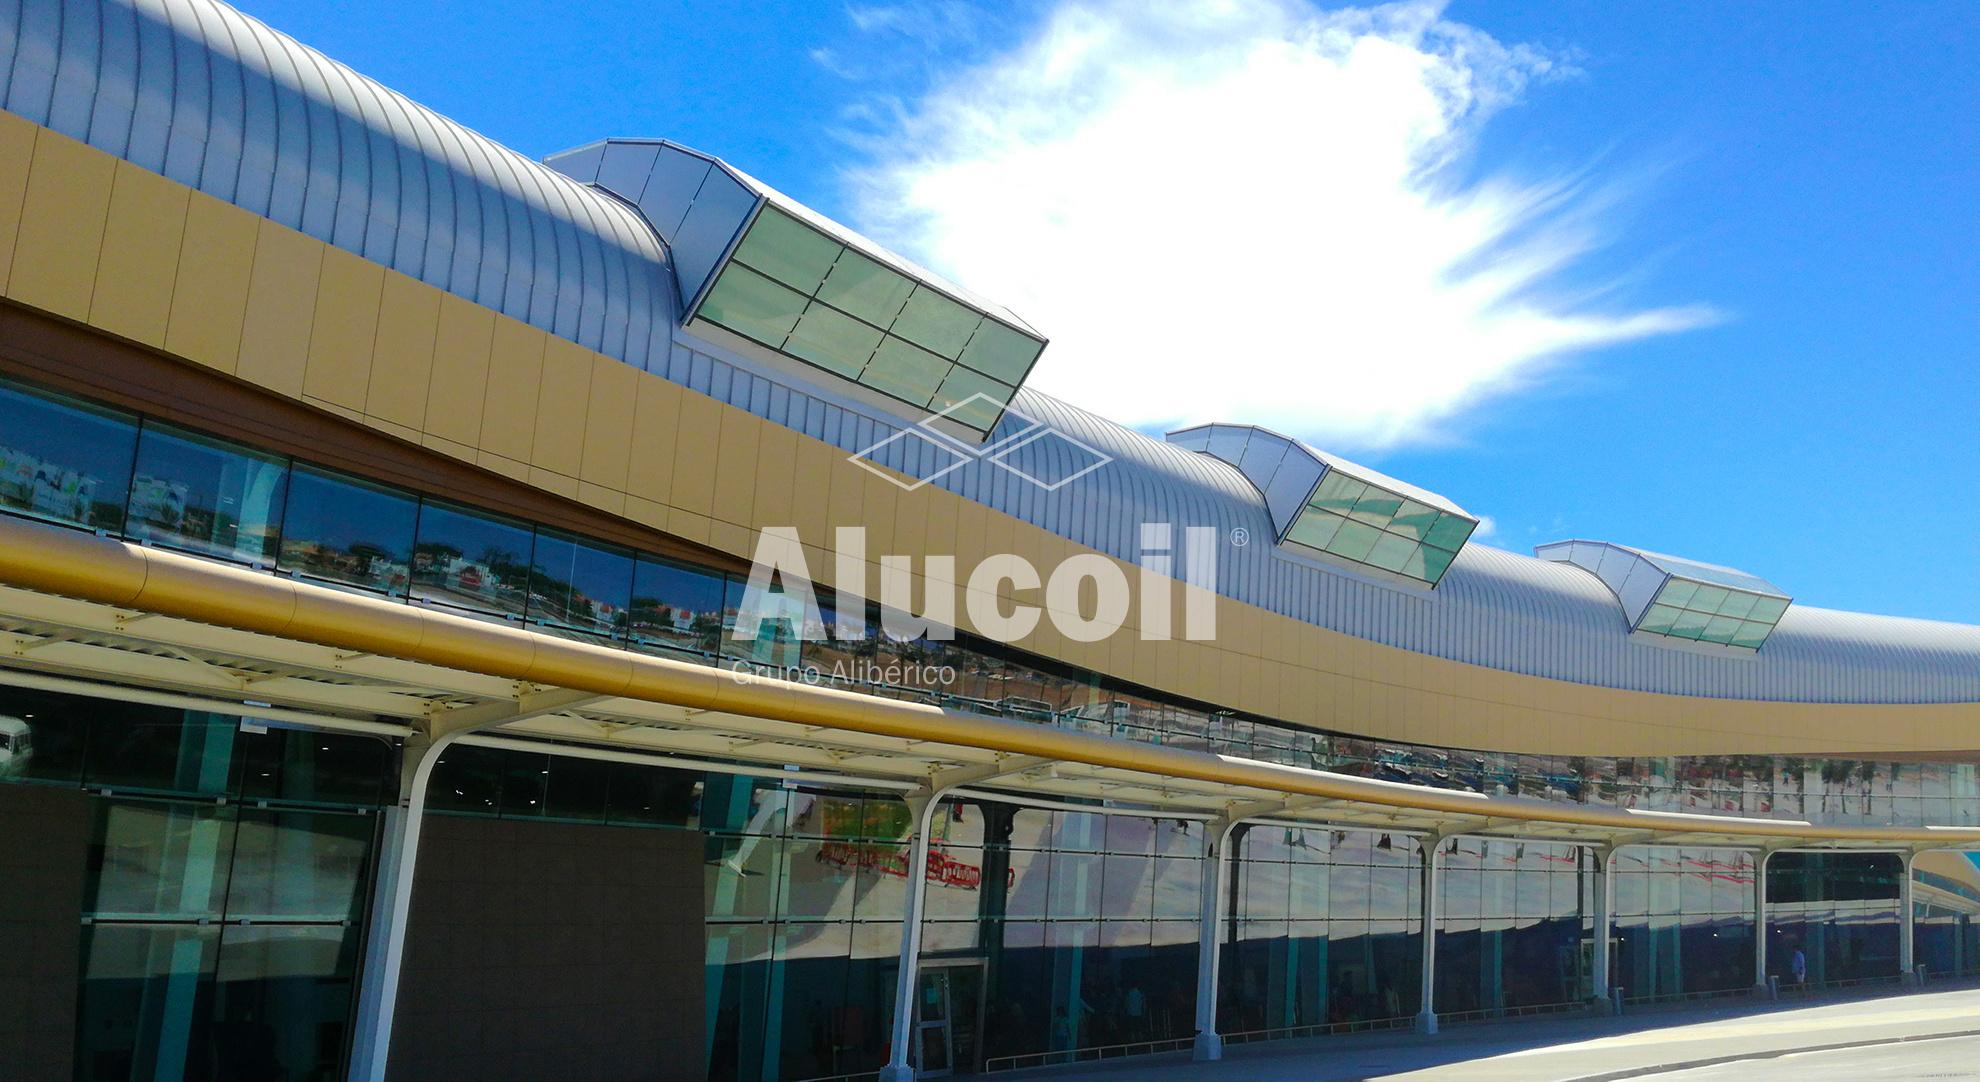 Faro International Airport